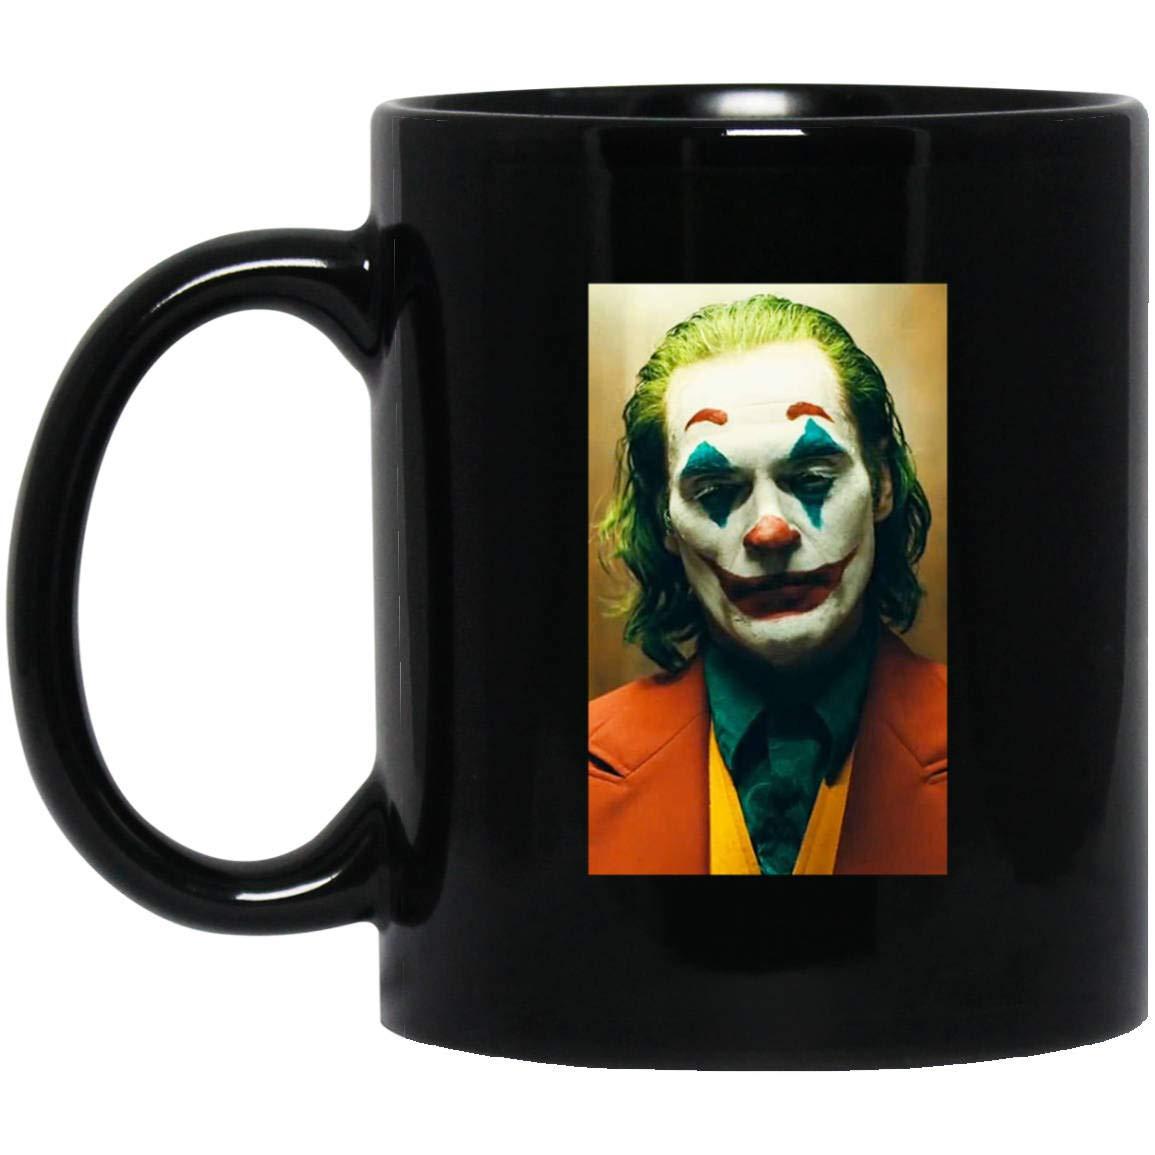 Joker Can We Kiss Forever - HD Wallpaper